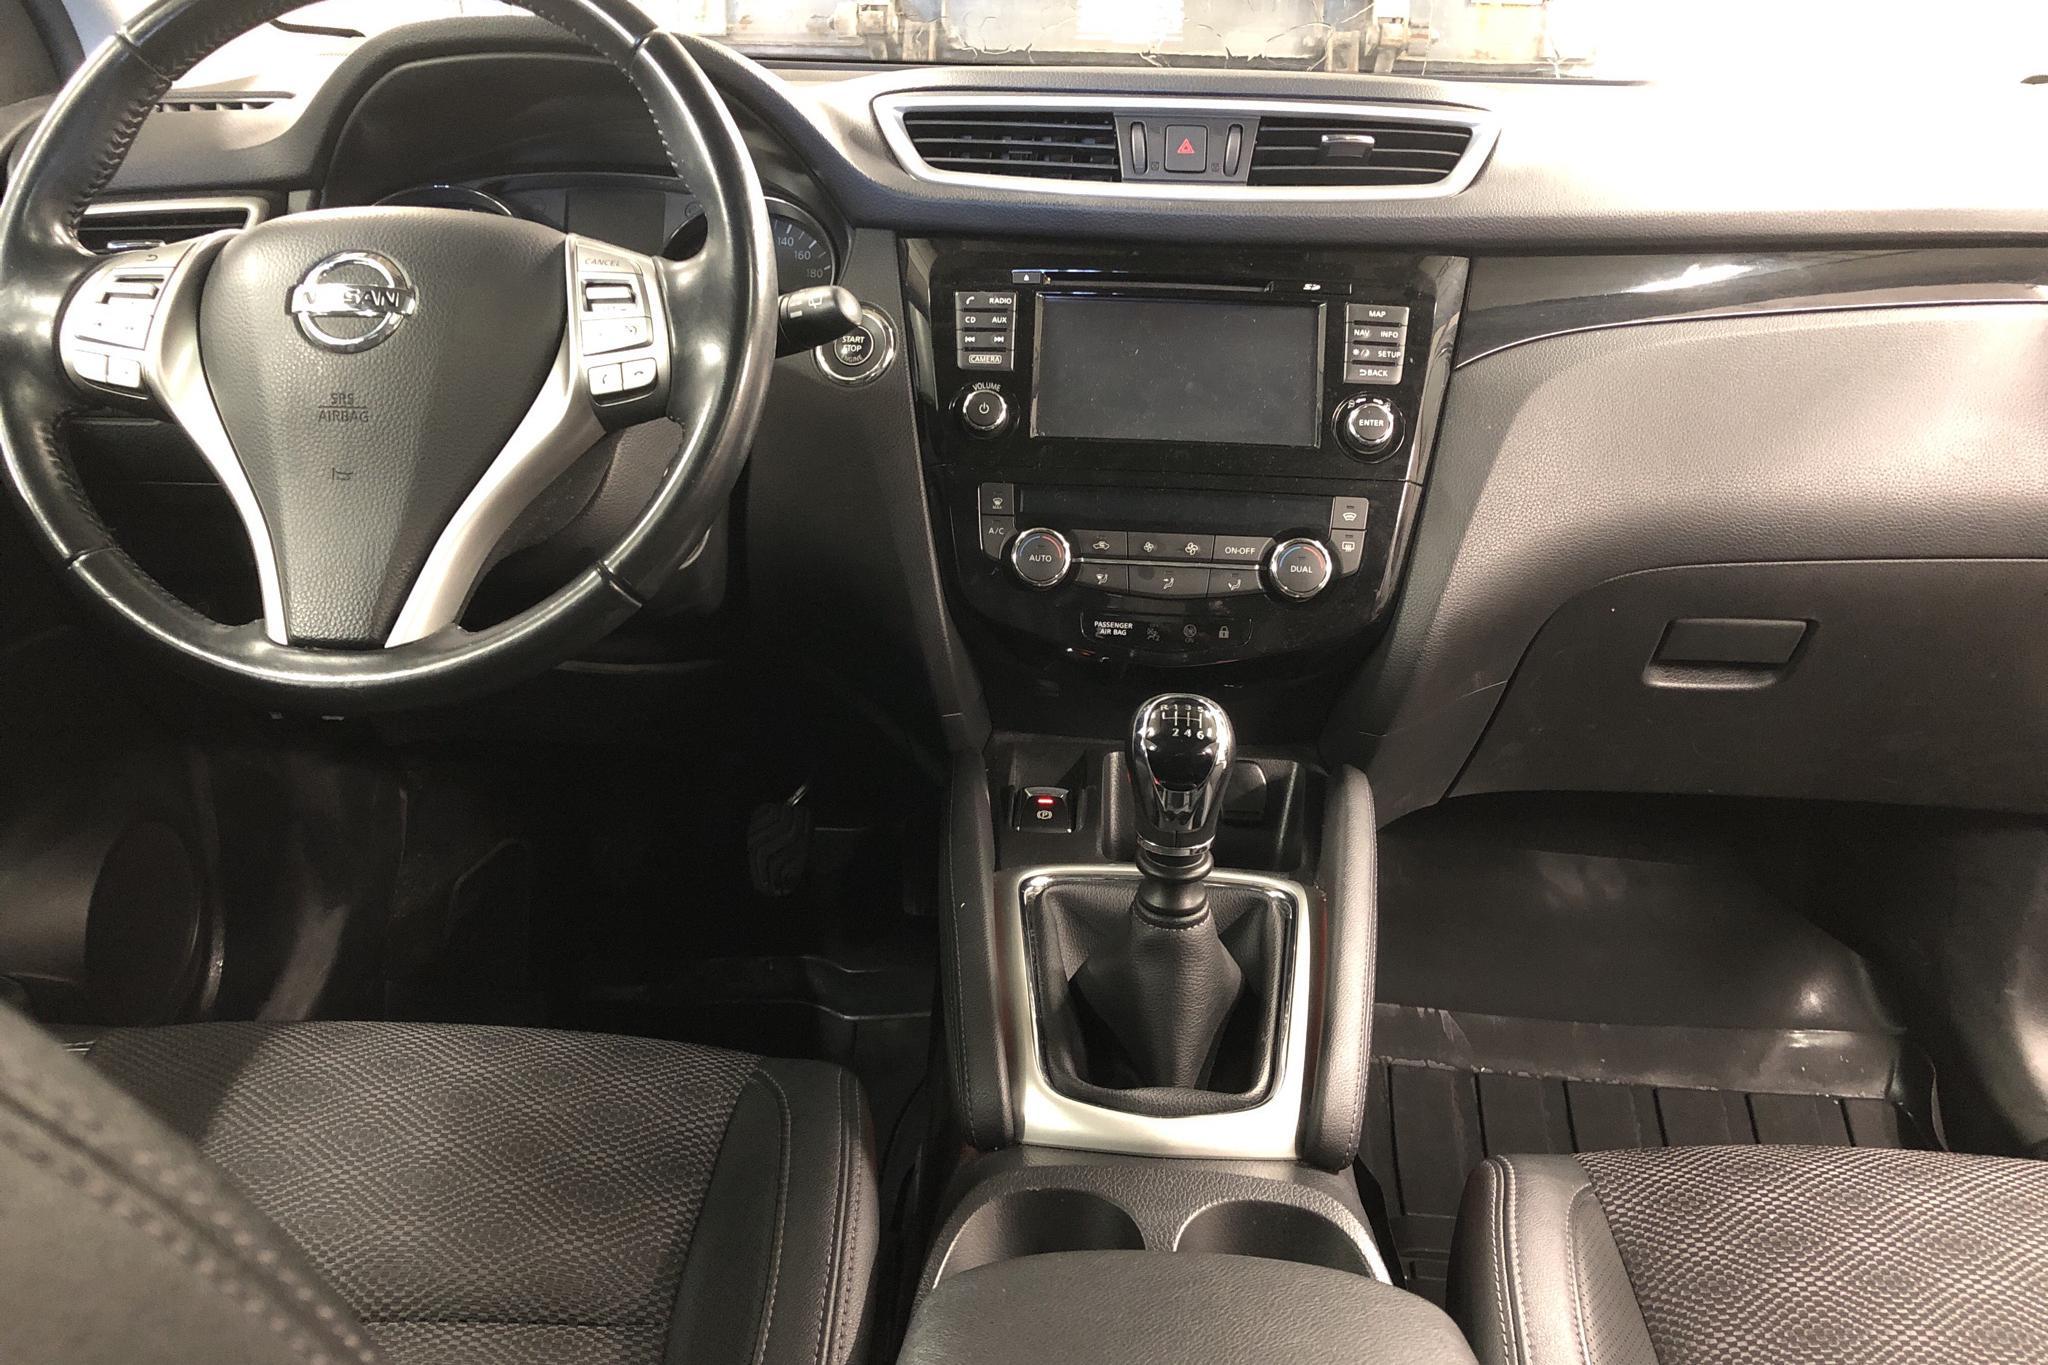 Nissan Qashqai 1.6 dCi (130hk) - 110 000 km - Manual - black - 2015